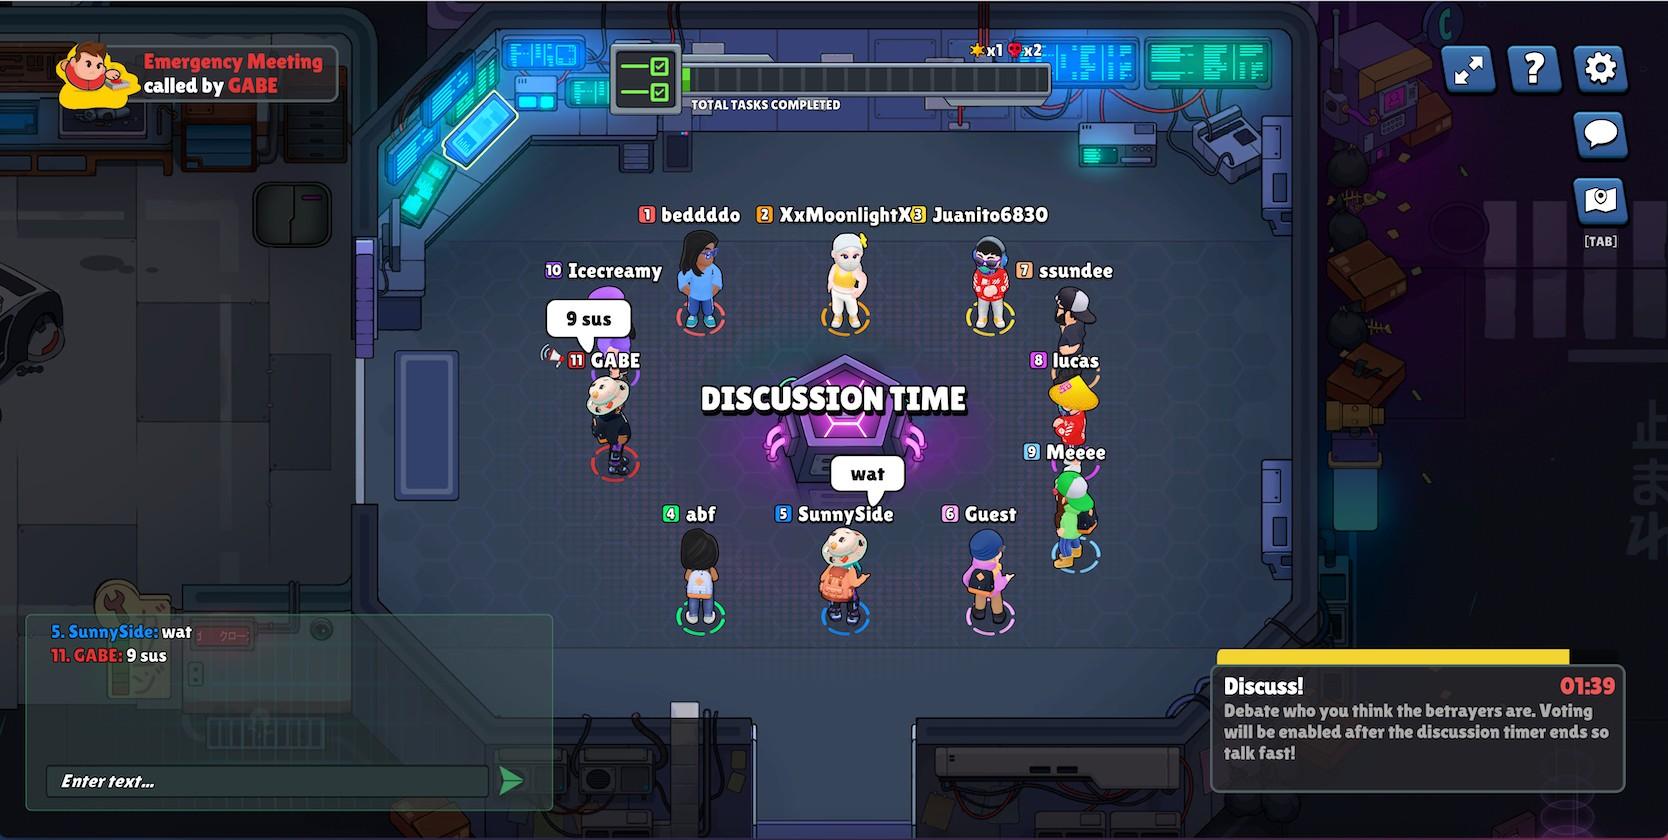 Betrayal browser game screenshot